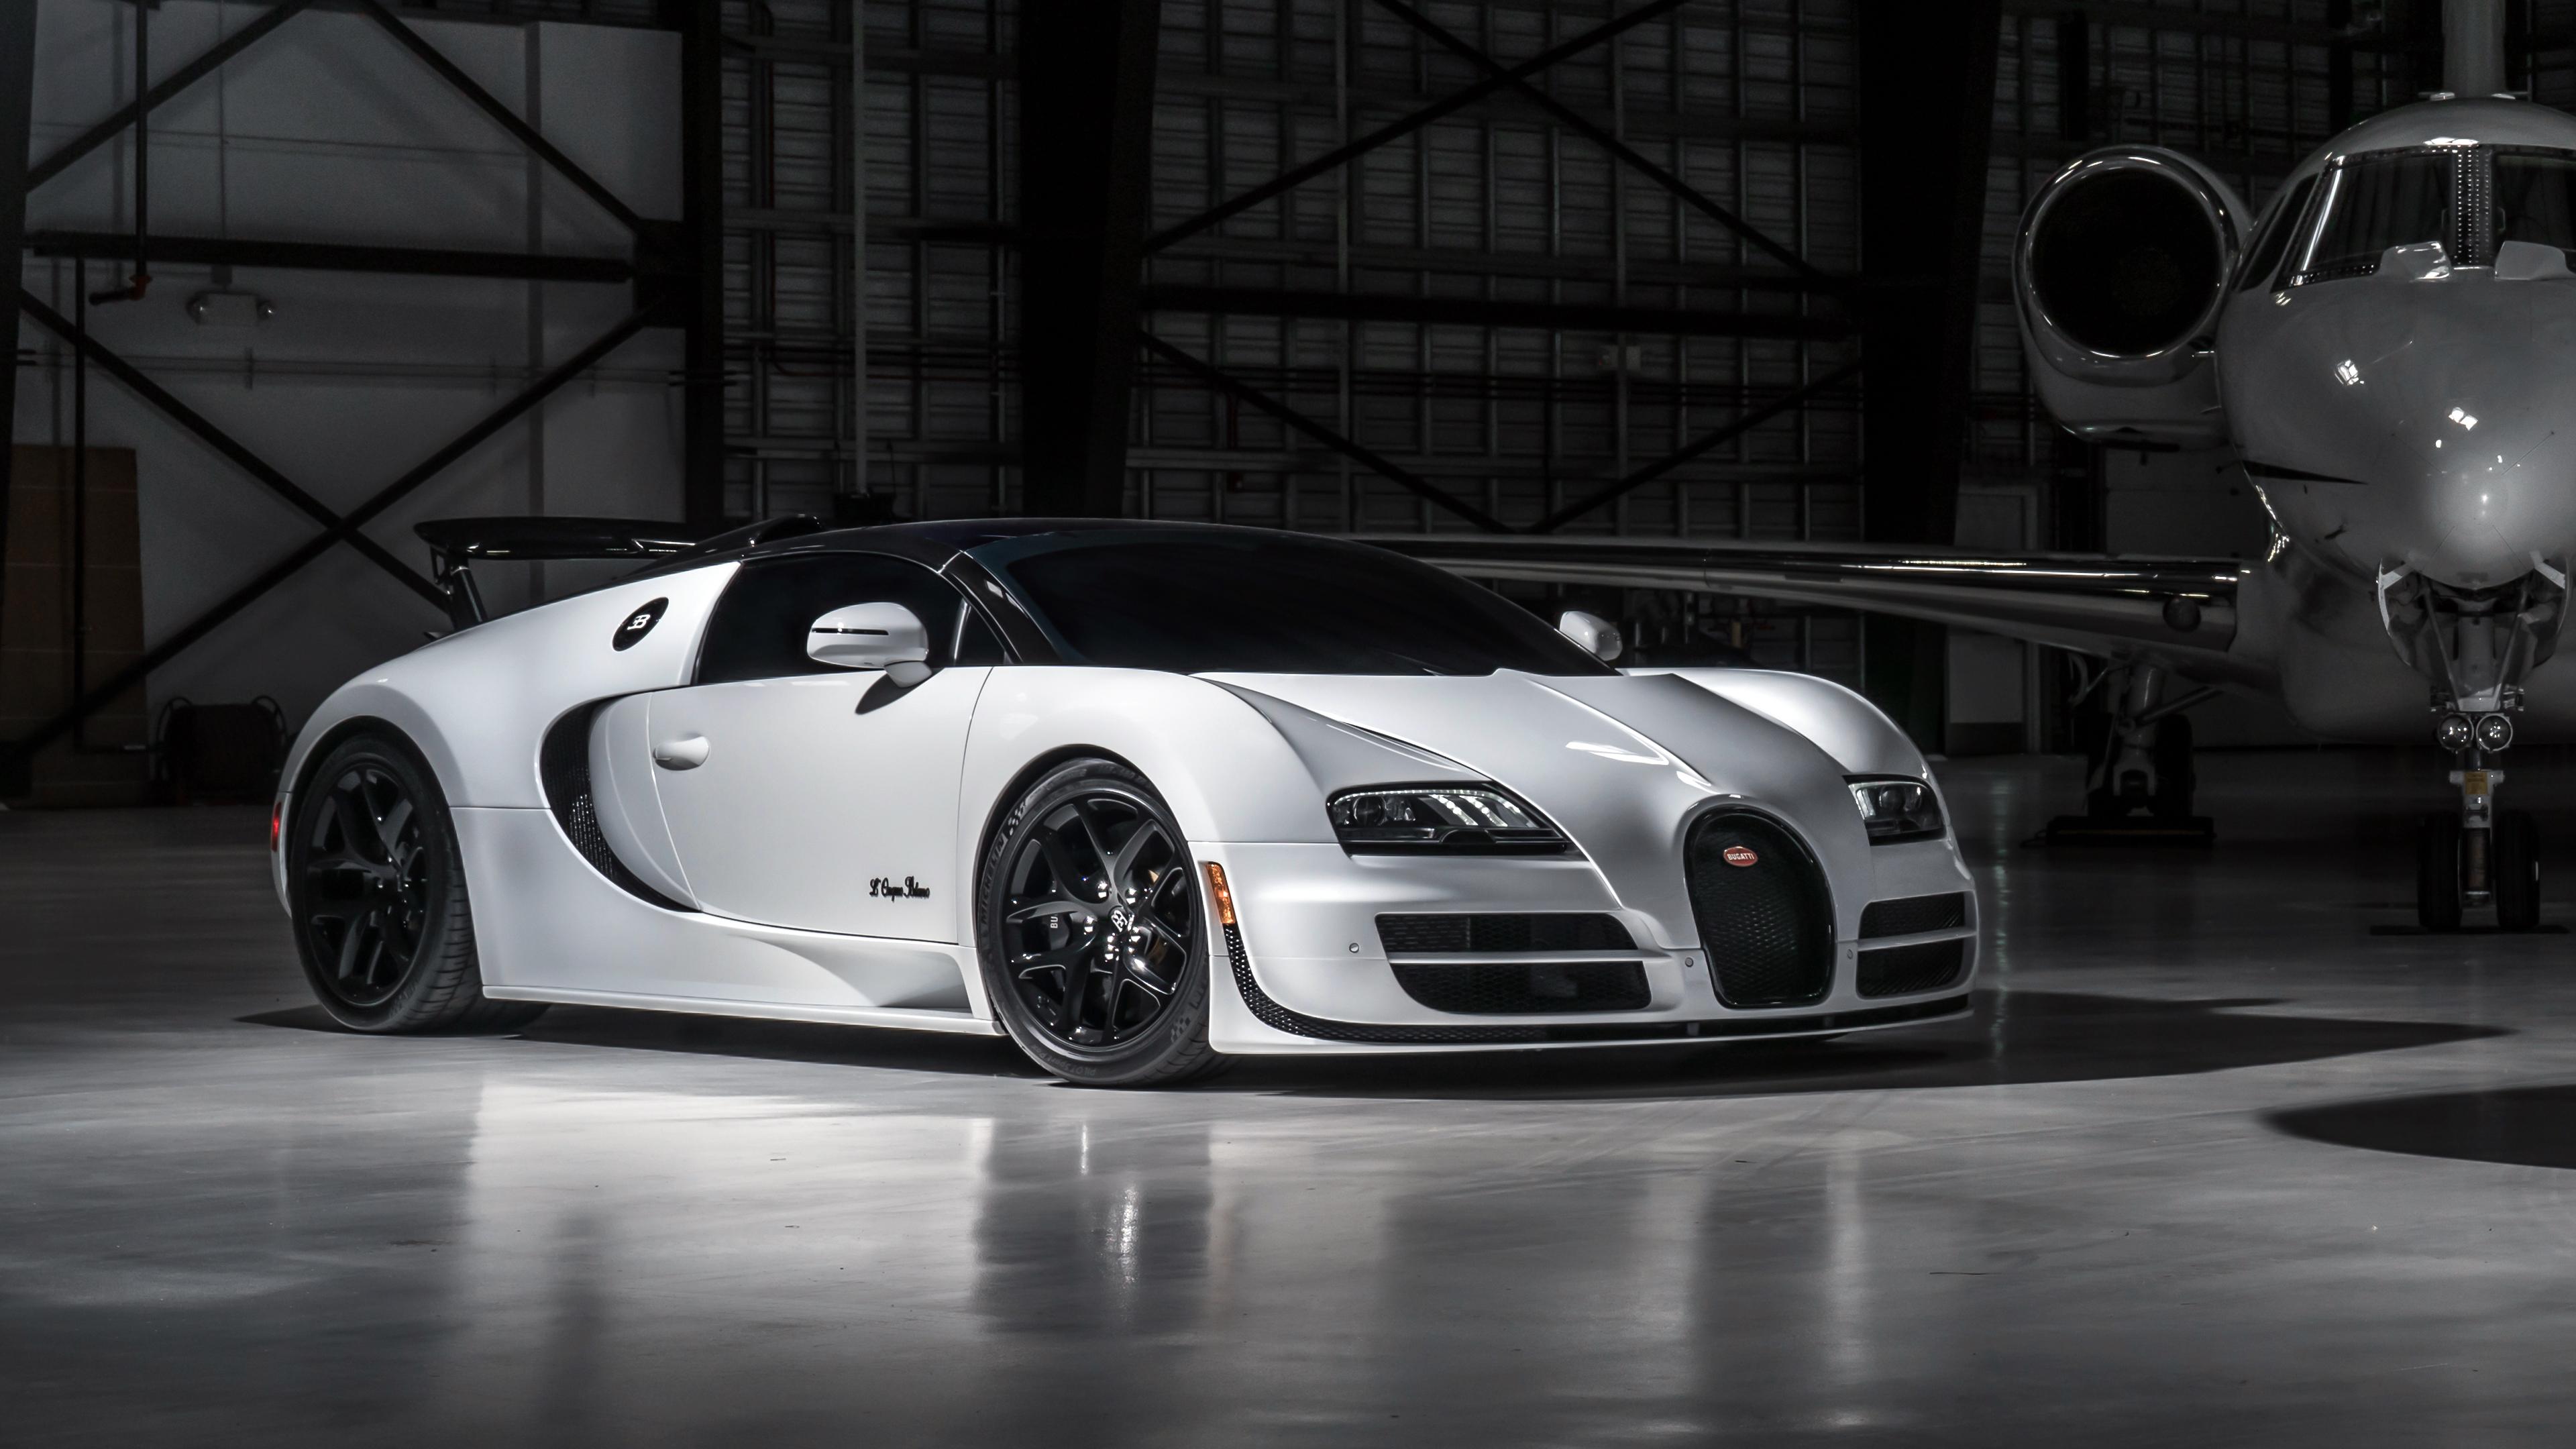 Bugatti Veyron Super Sport 4k Wallpaper: Bugatti Veyron Grand Sport Vitesse Roadster 4k 2020, HD